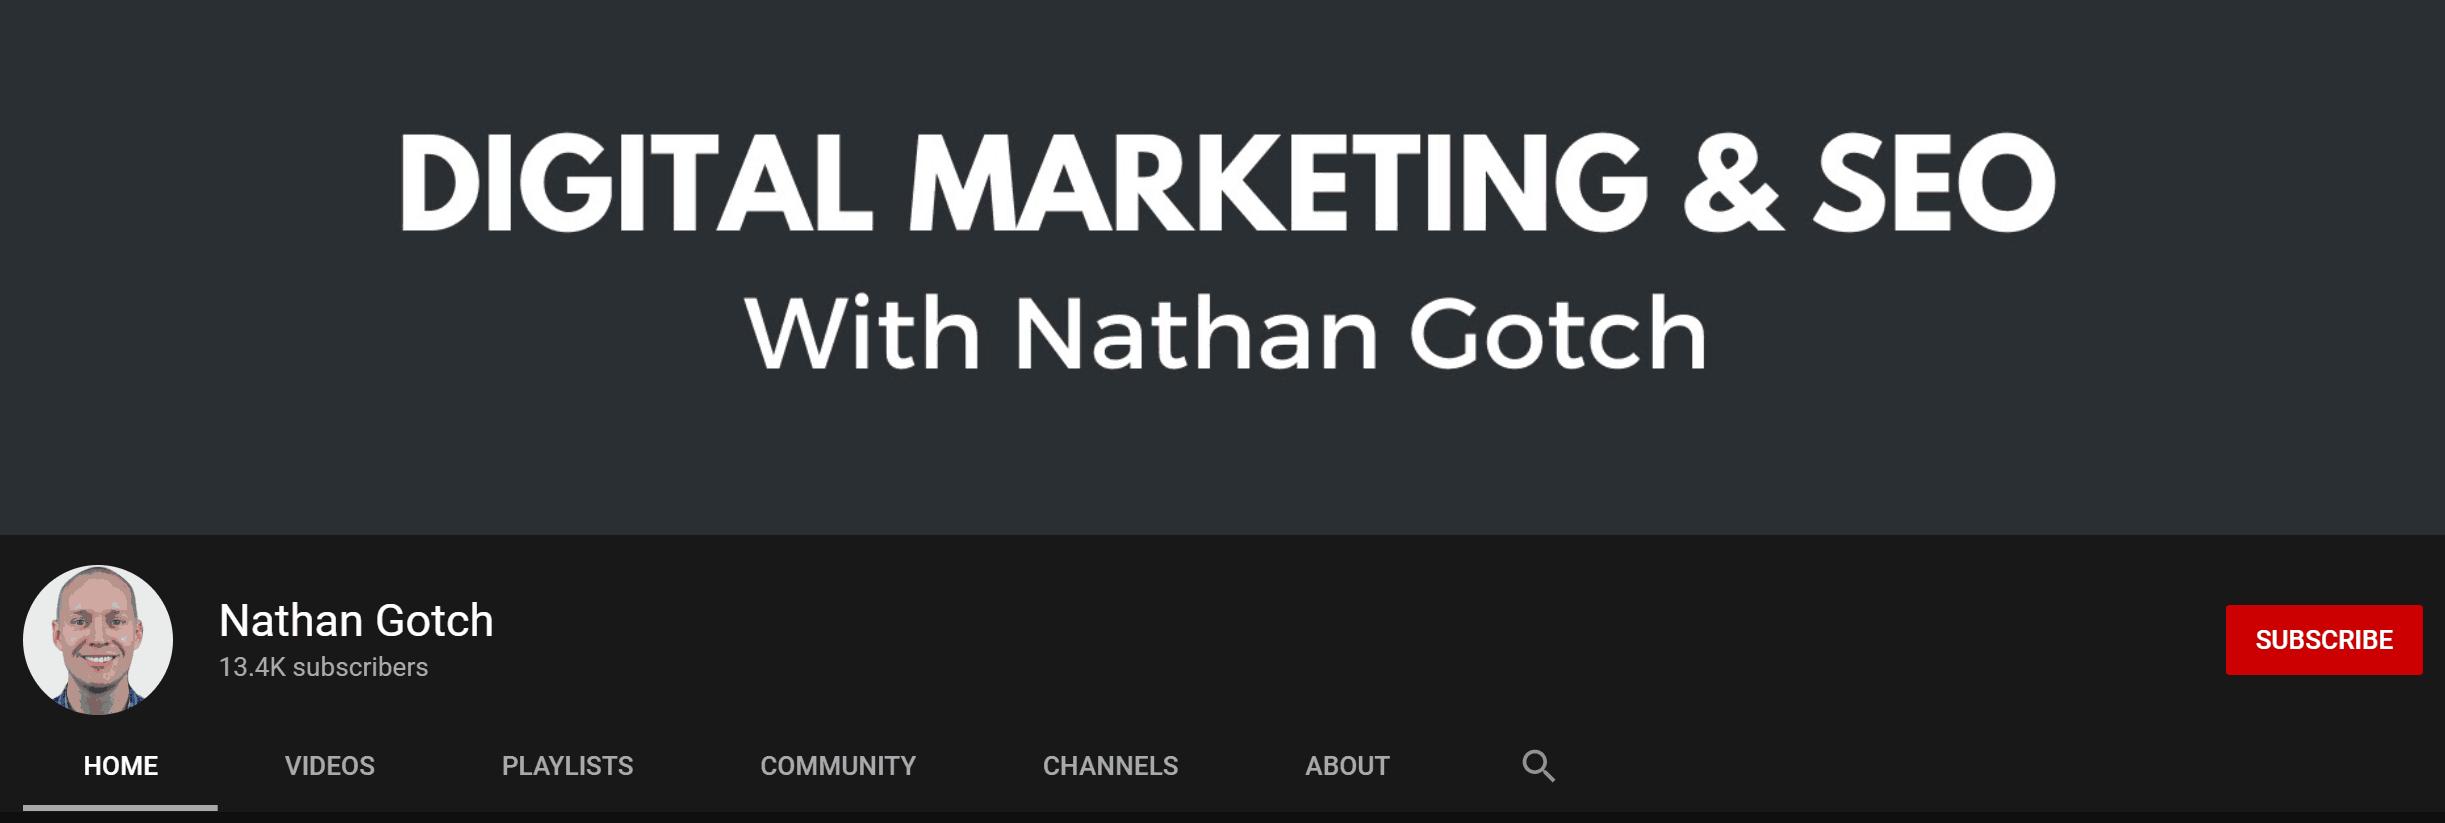 Nathan Gotch Youtube Channel